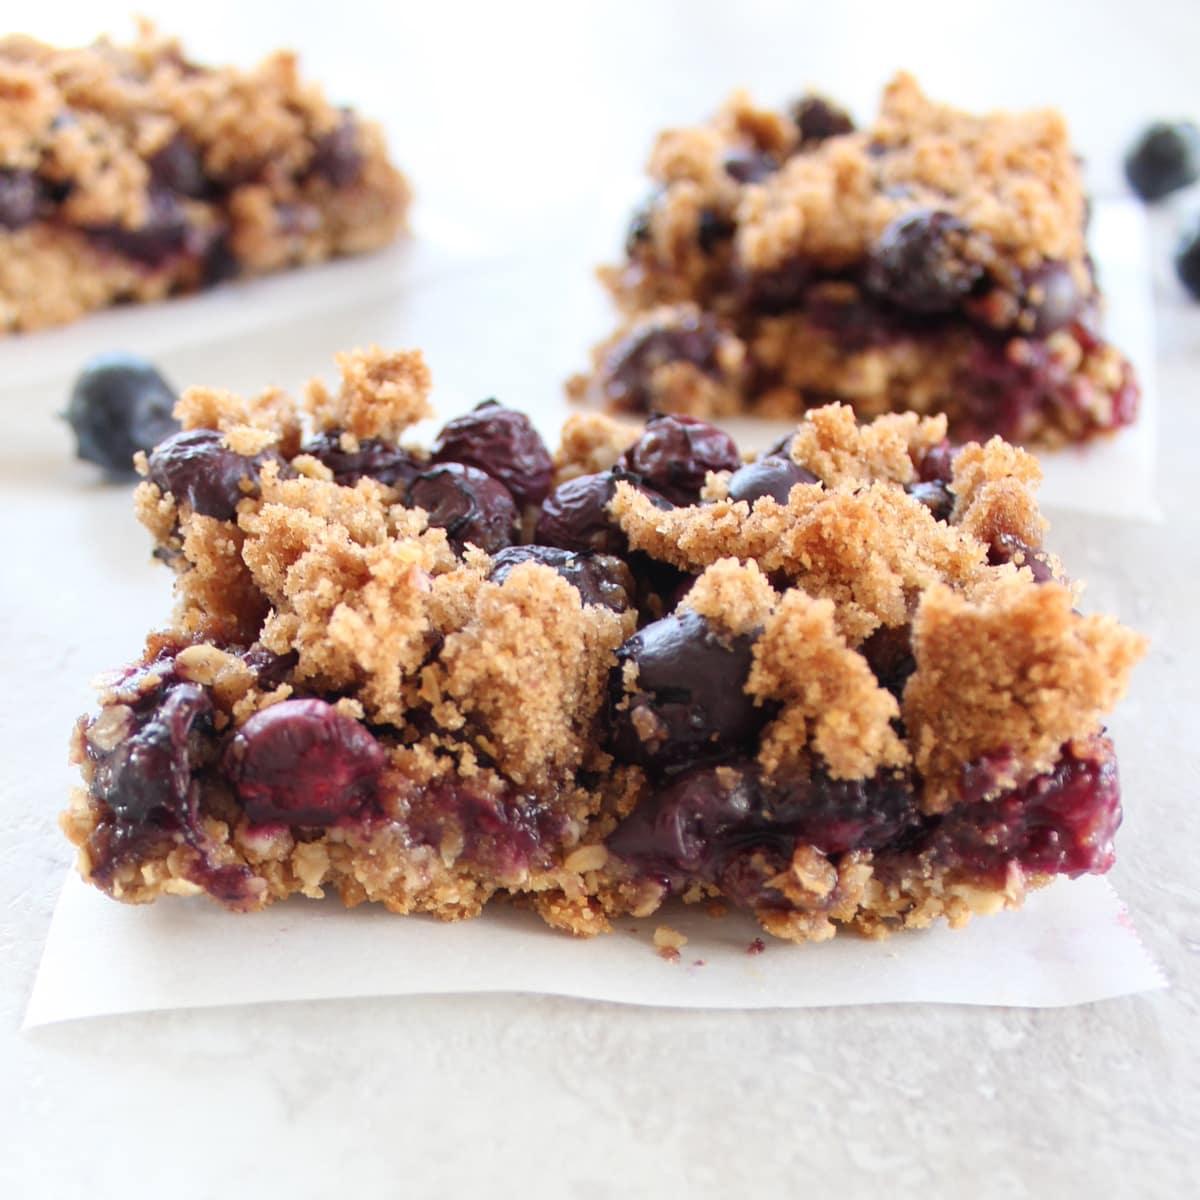 Gluten Free Blueberry Oat Bars